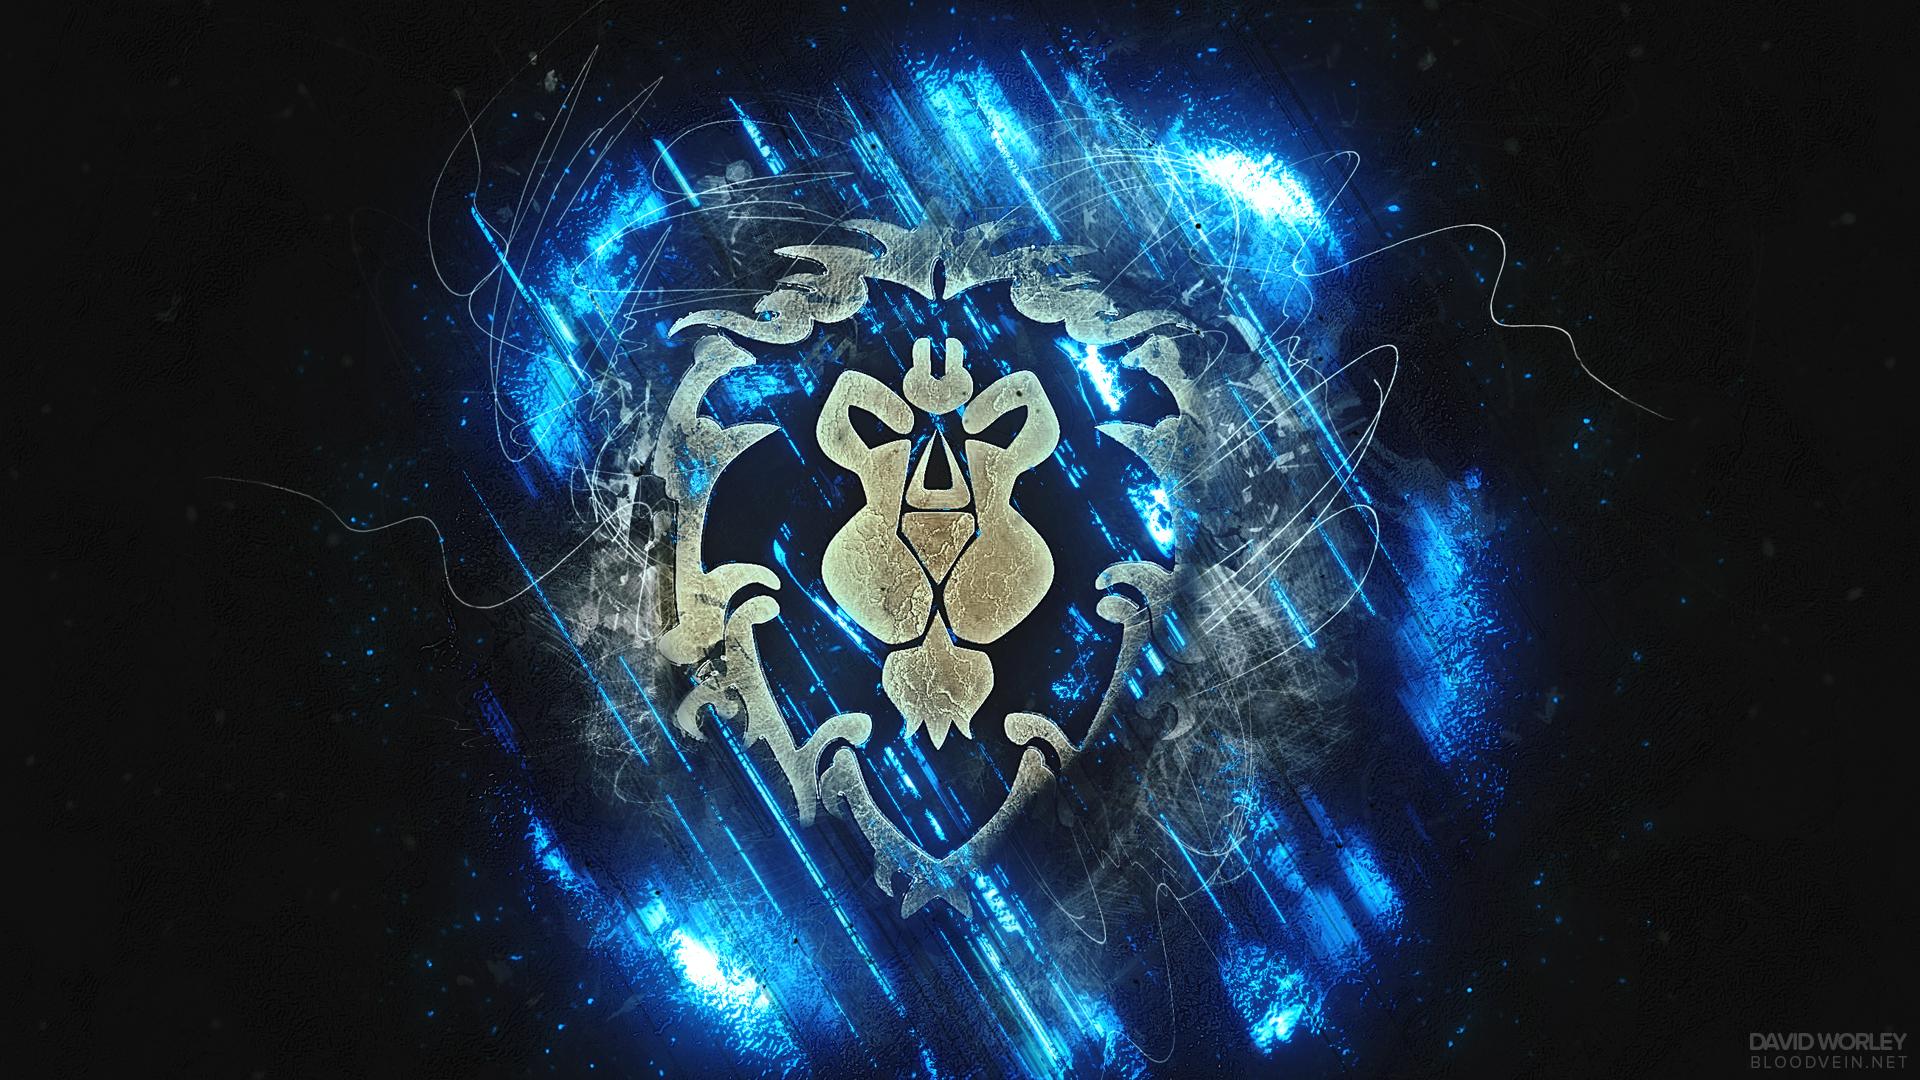 50 World Of Warcraft Live Wallpaper On Wallpapersafari